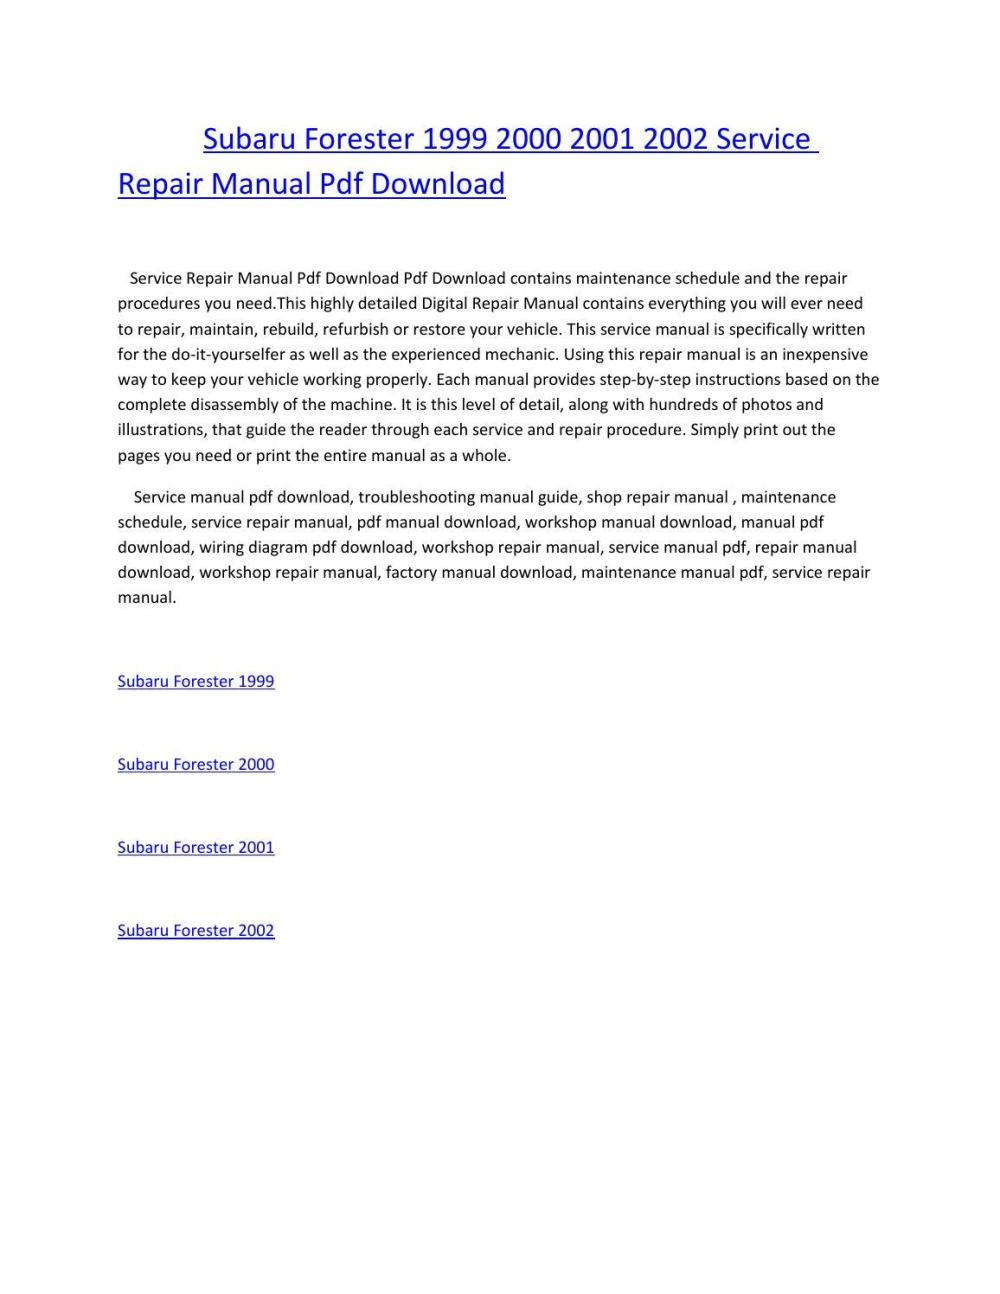 medium resolution of subaru forester wiring diagram pdf